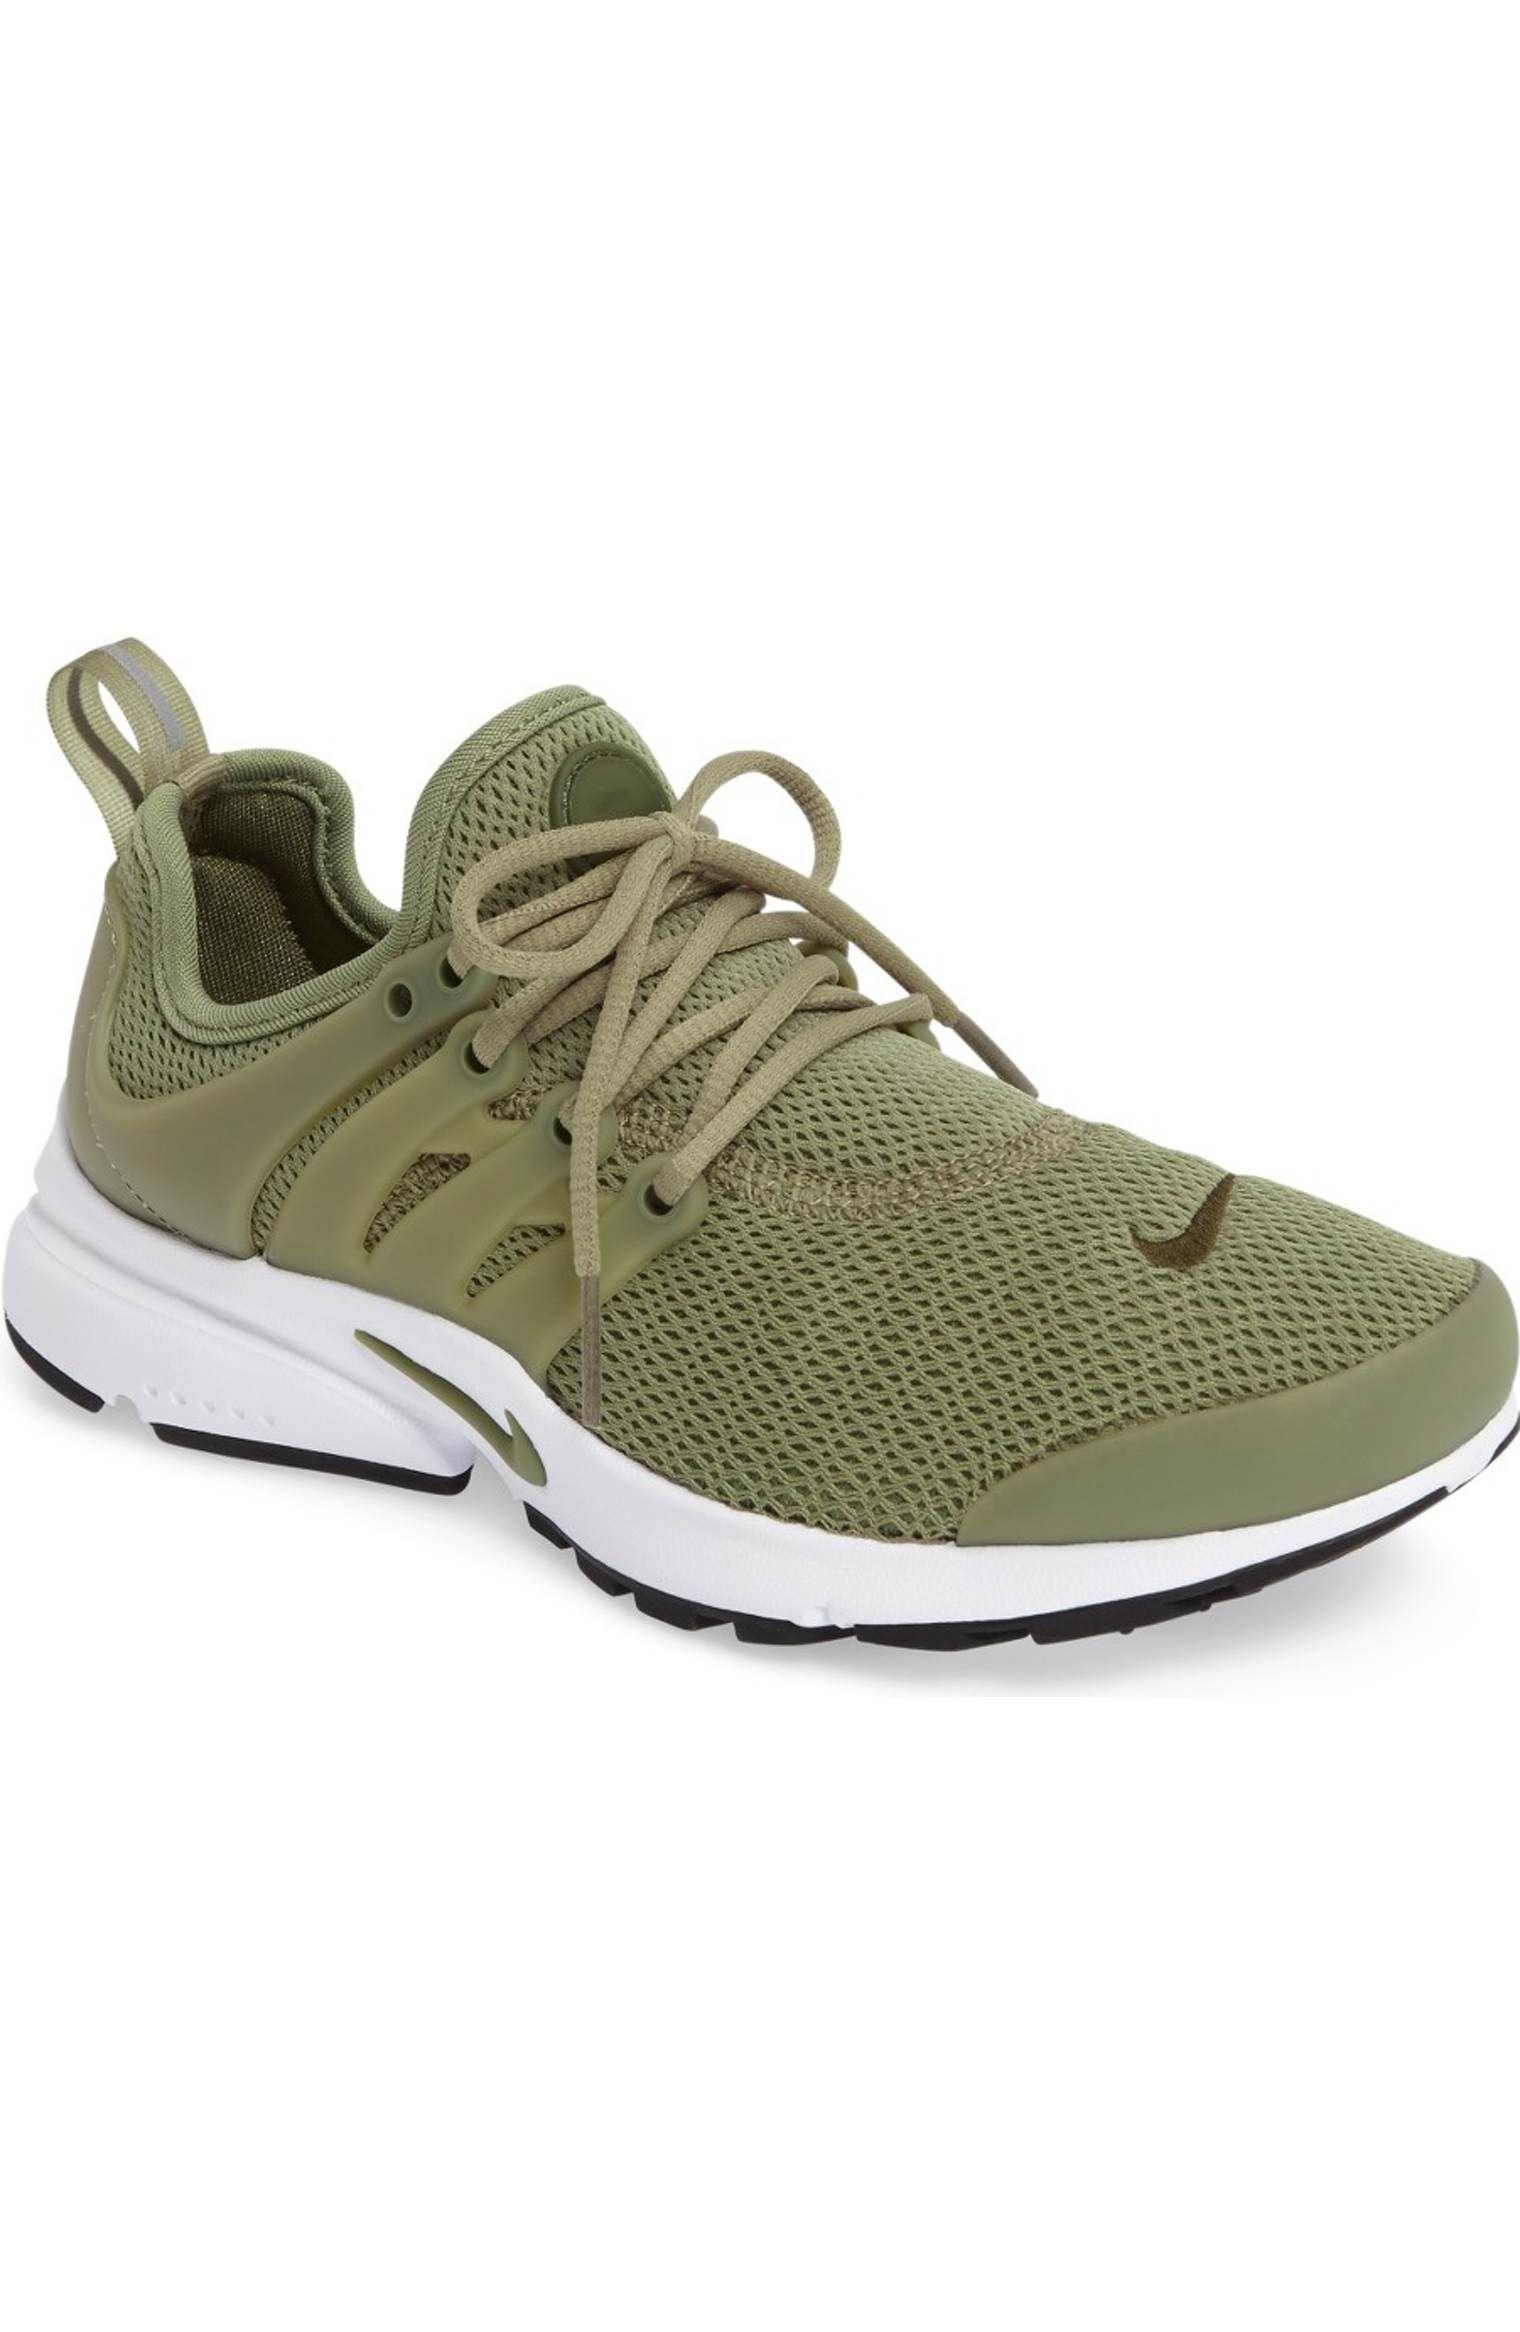 b7bb8a5cb Main Image - Nike Air Presto Sneaker (Women) Nike Air Presto Green, Running